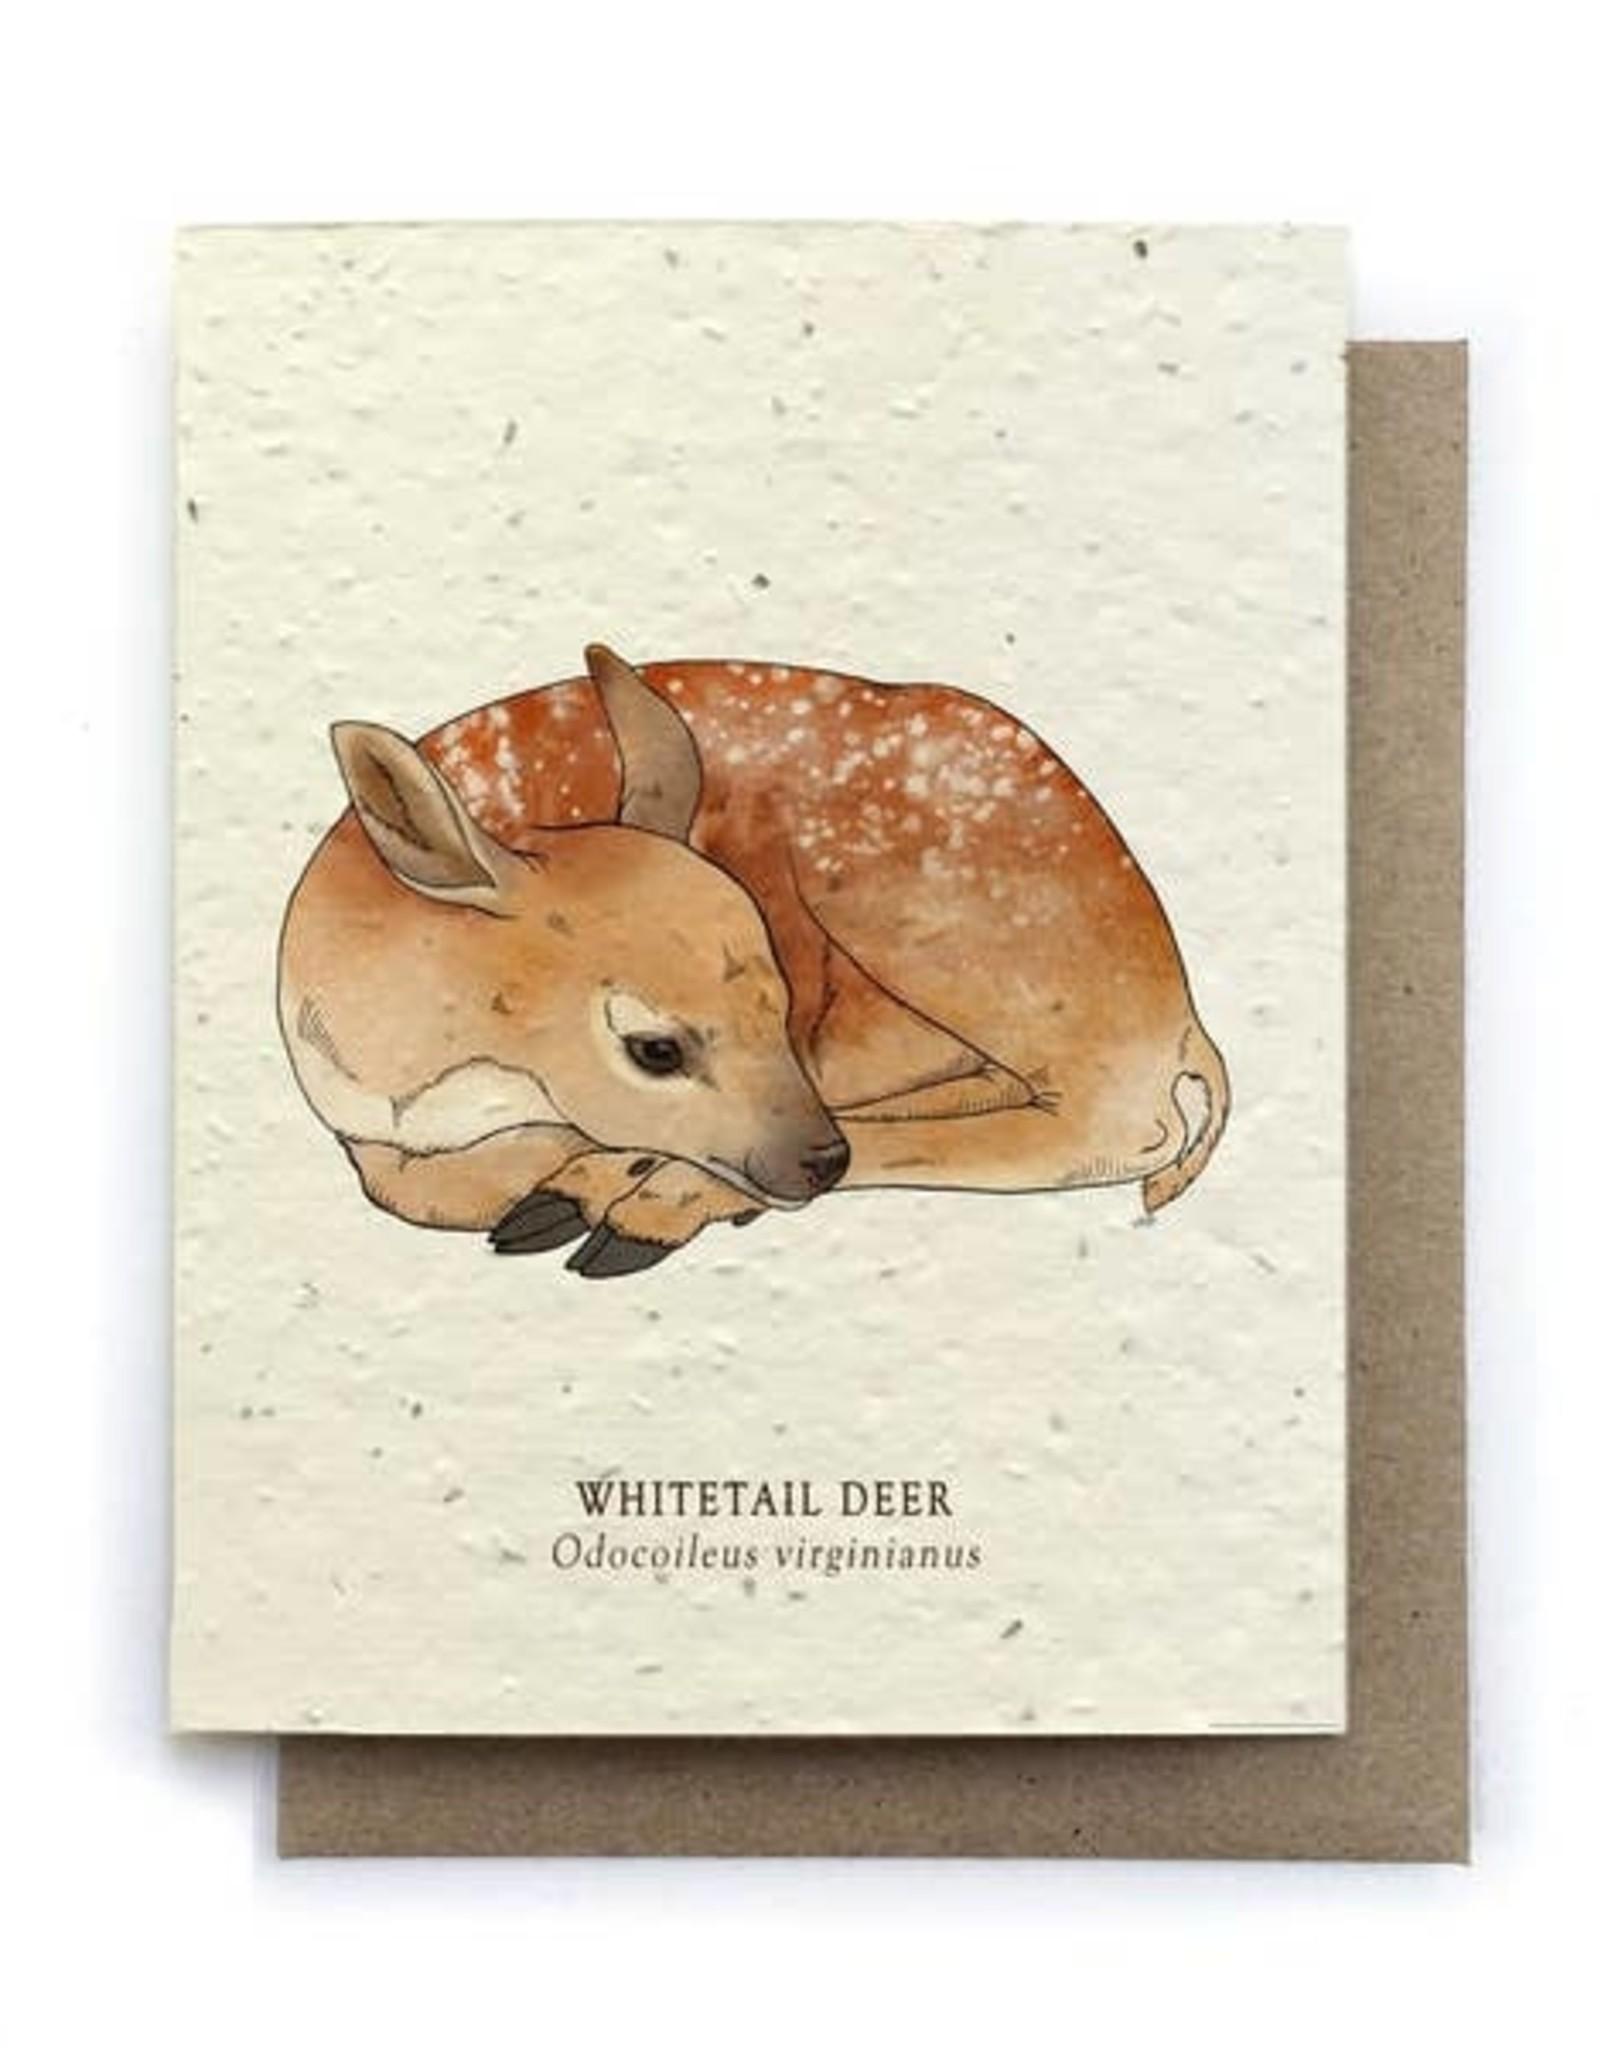 LeBLANC finds Deer Animal Greeting Cards - Plantable Seed Paper